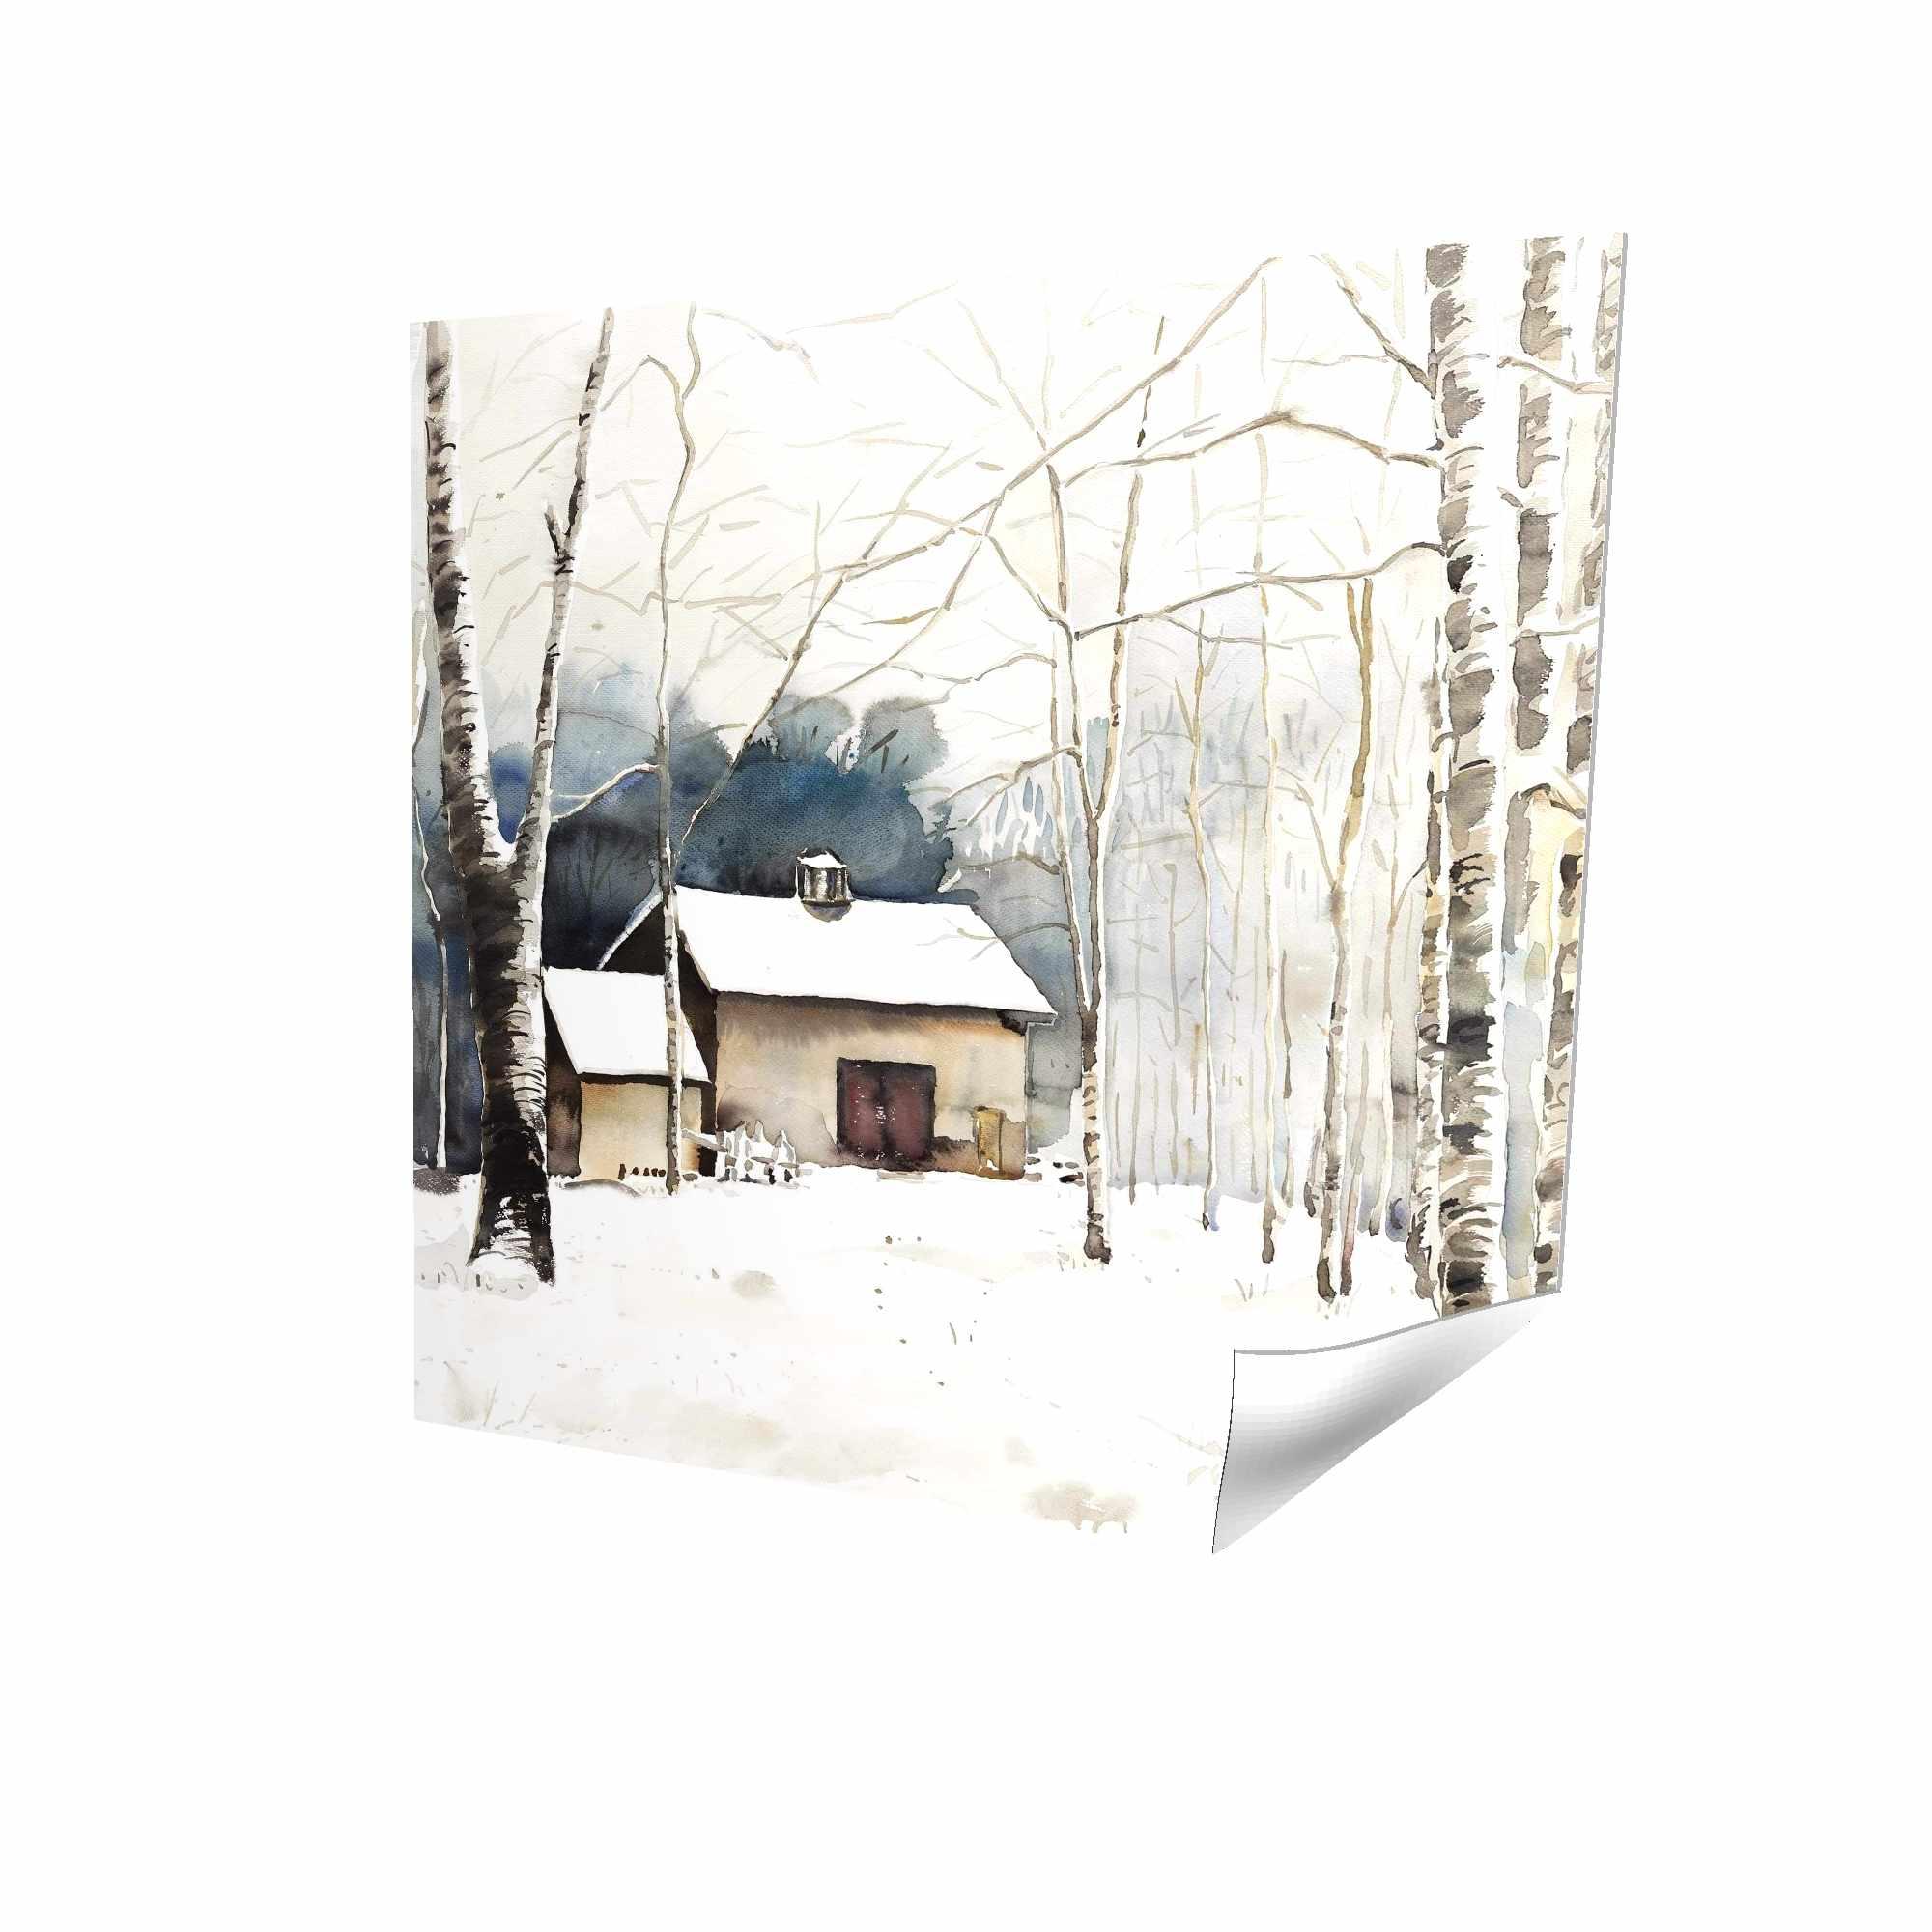 Petite grange d'hiver